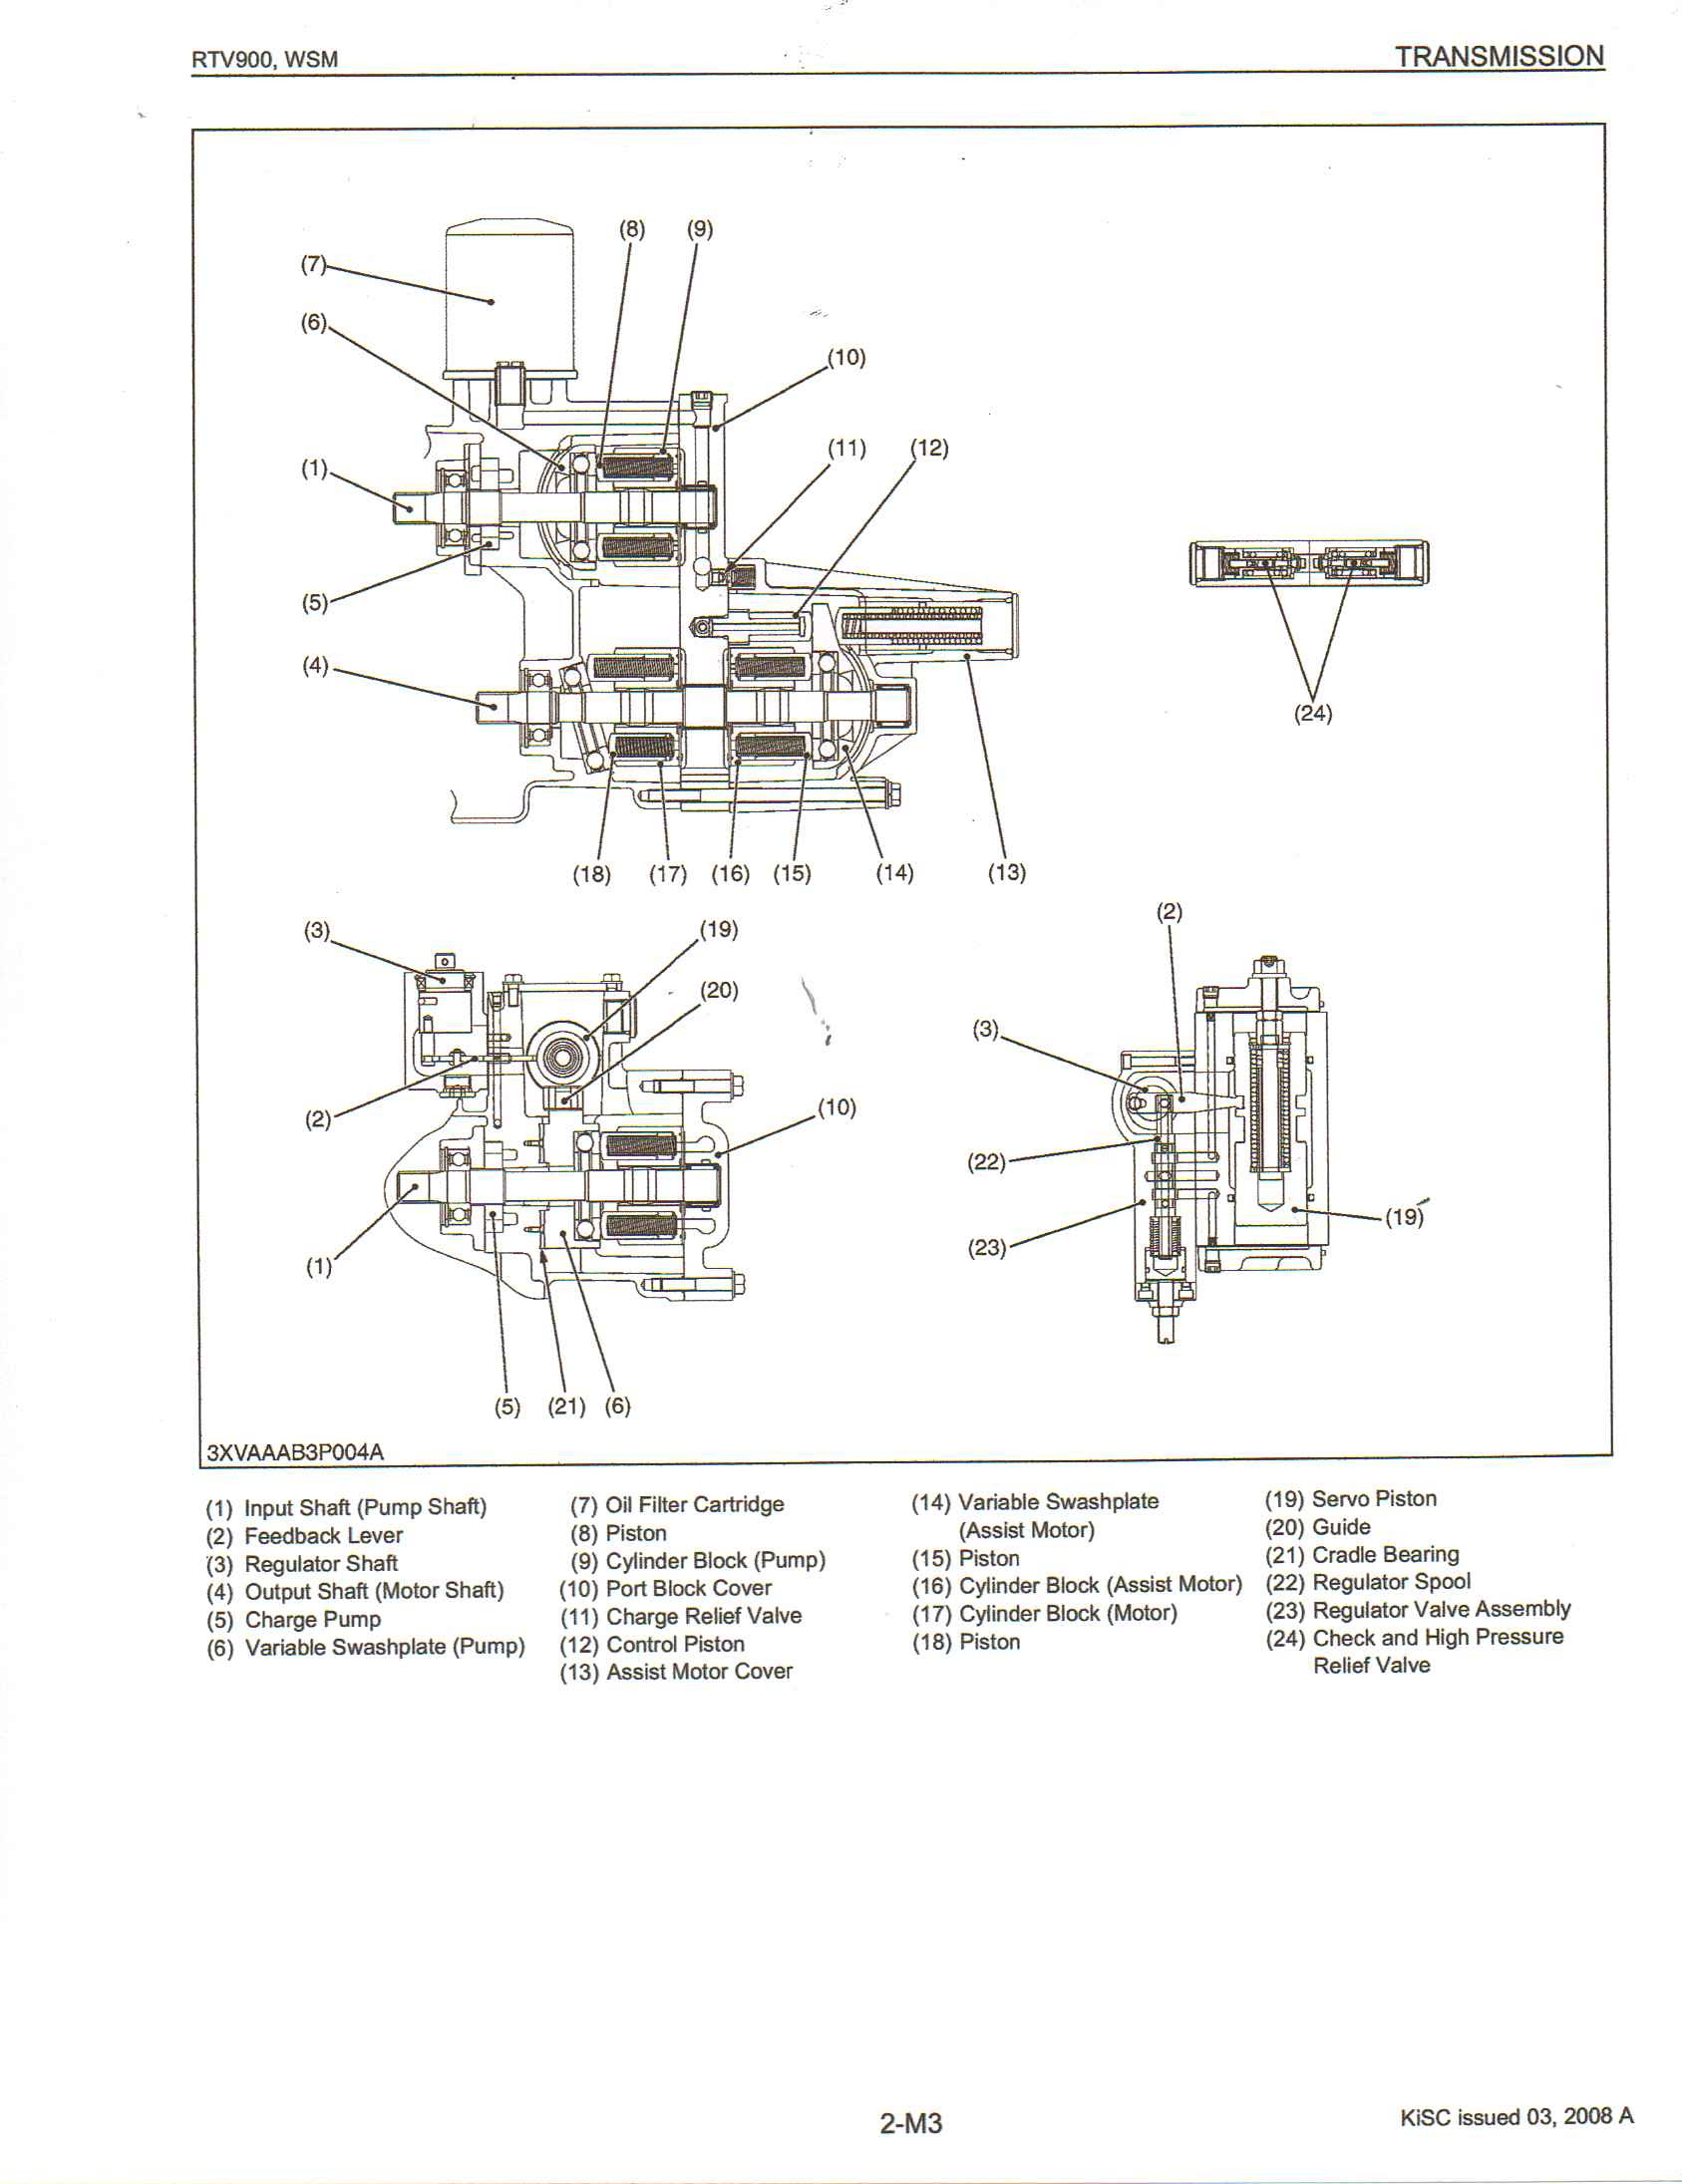 kubota rtv wiring schematic 33 kubota rtv 1100 parts diagram wiring diagram list  33 kubota rtv 1100 parts diagram